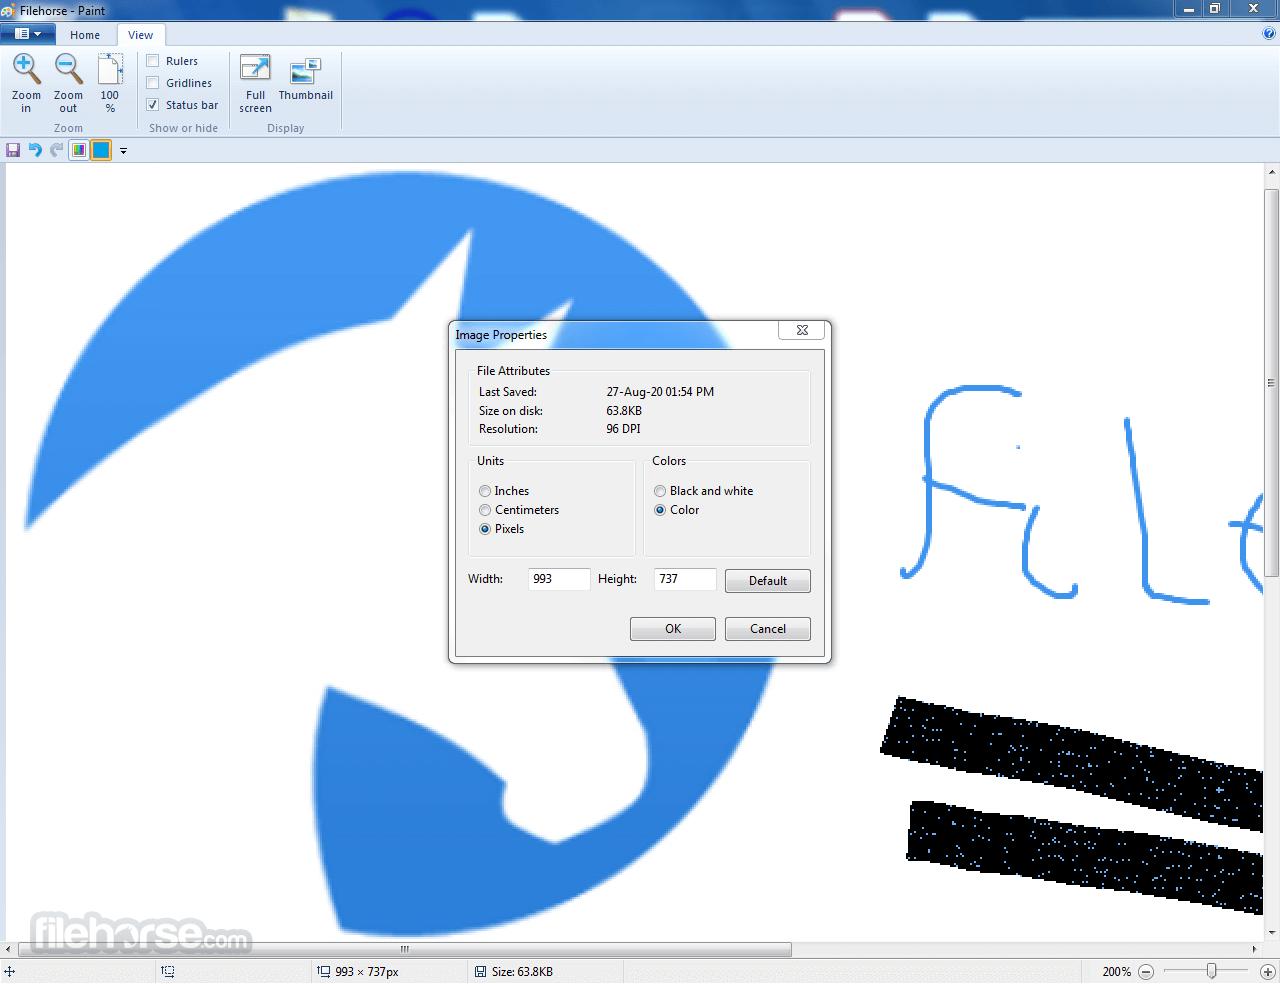 MS Paint 5.1.2600.5918 Screenshot 5